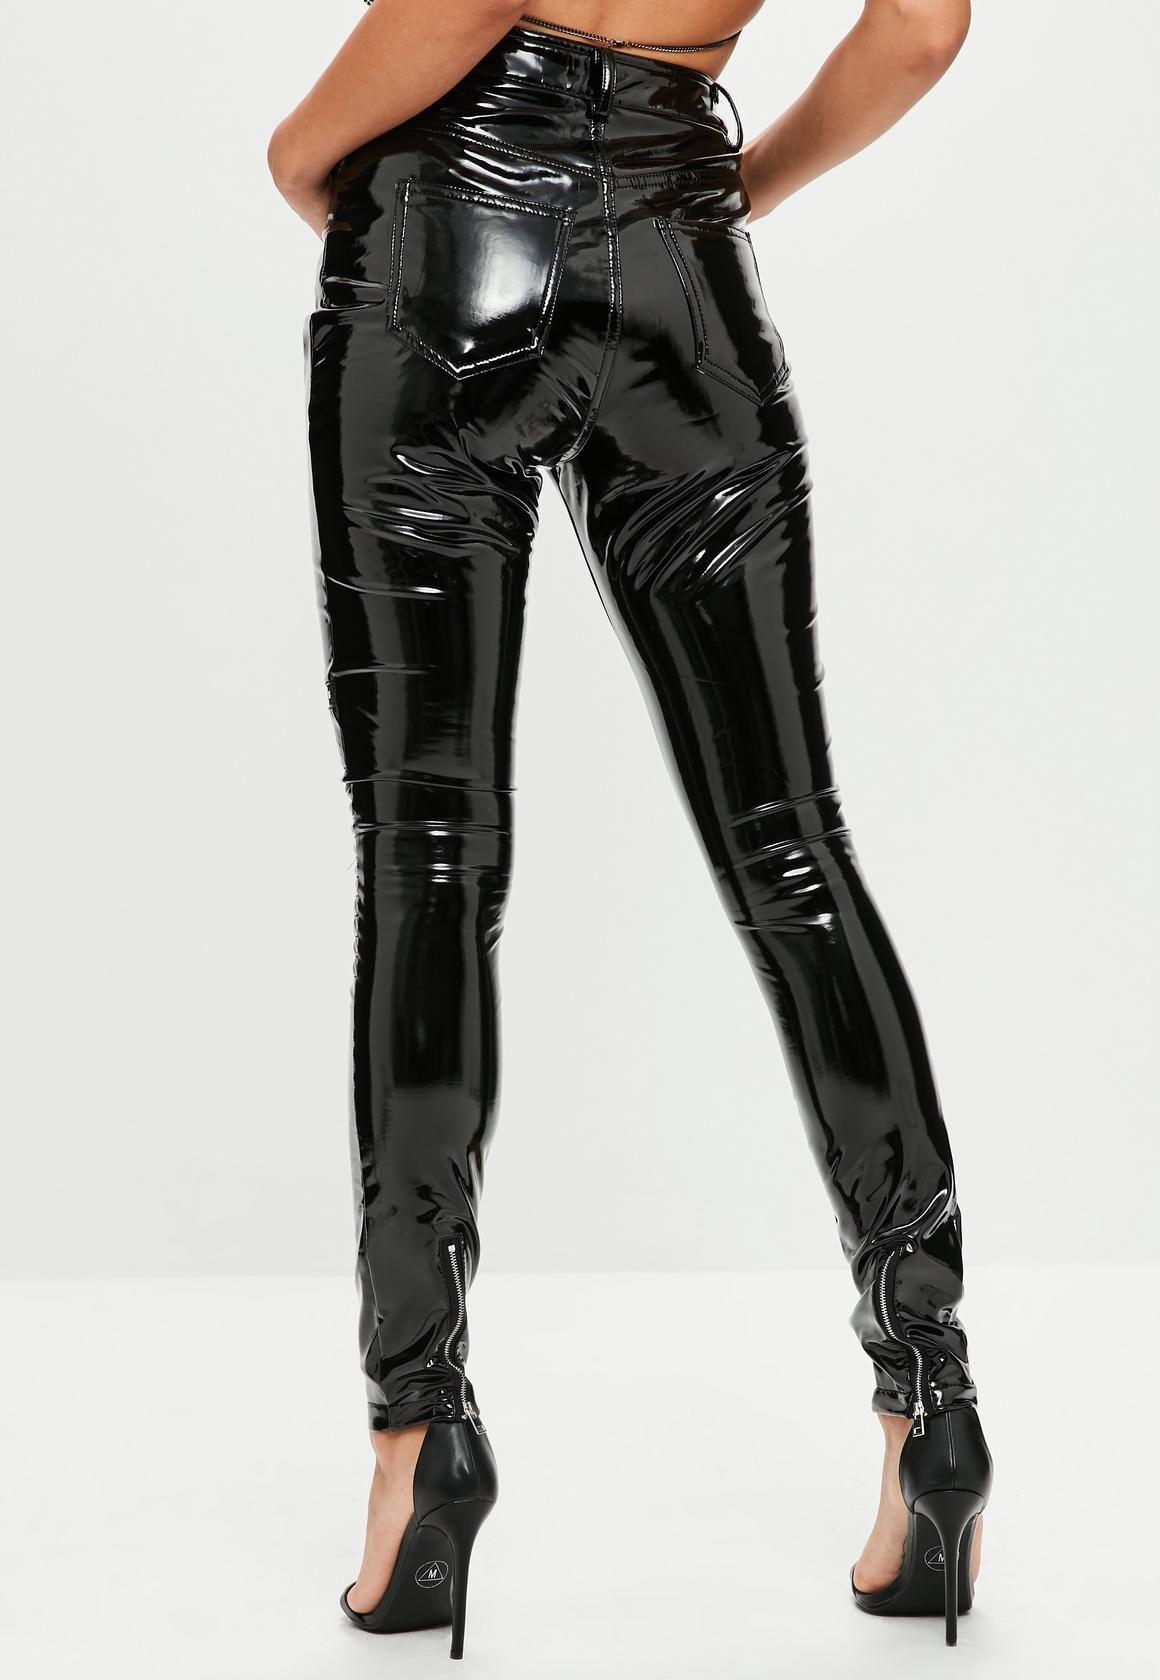 22980de5e5 Missguided - Tall Black Vinyl Biker Pants   michala bday clothes in ...